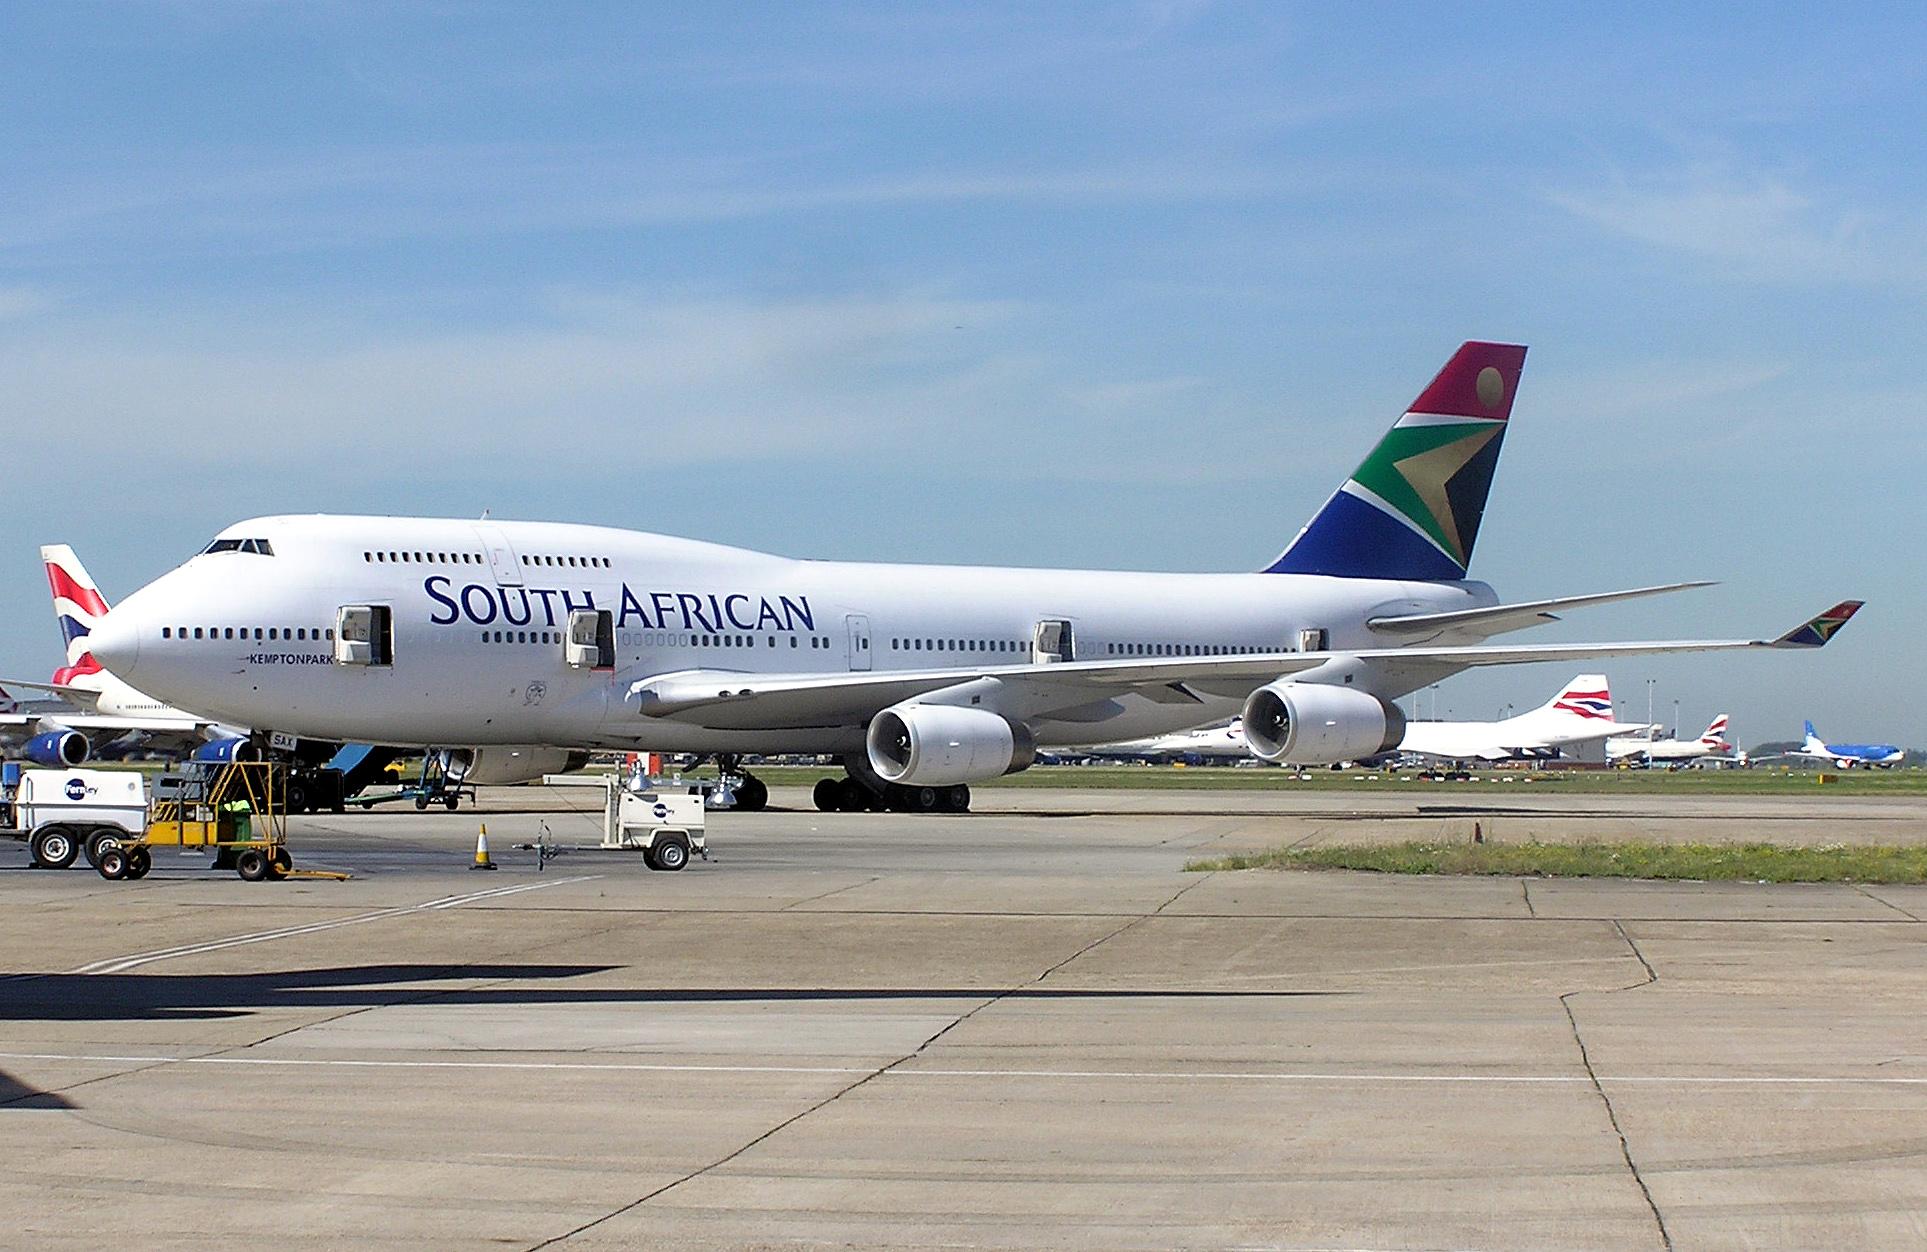 Travel Alert: South African Airways cancels flights ahead of strike